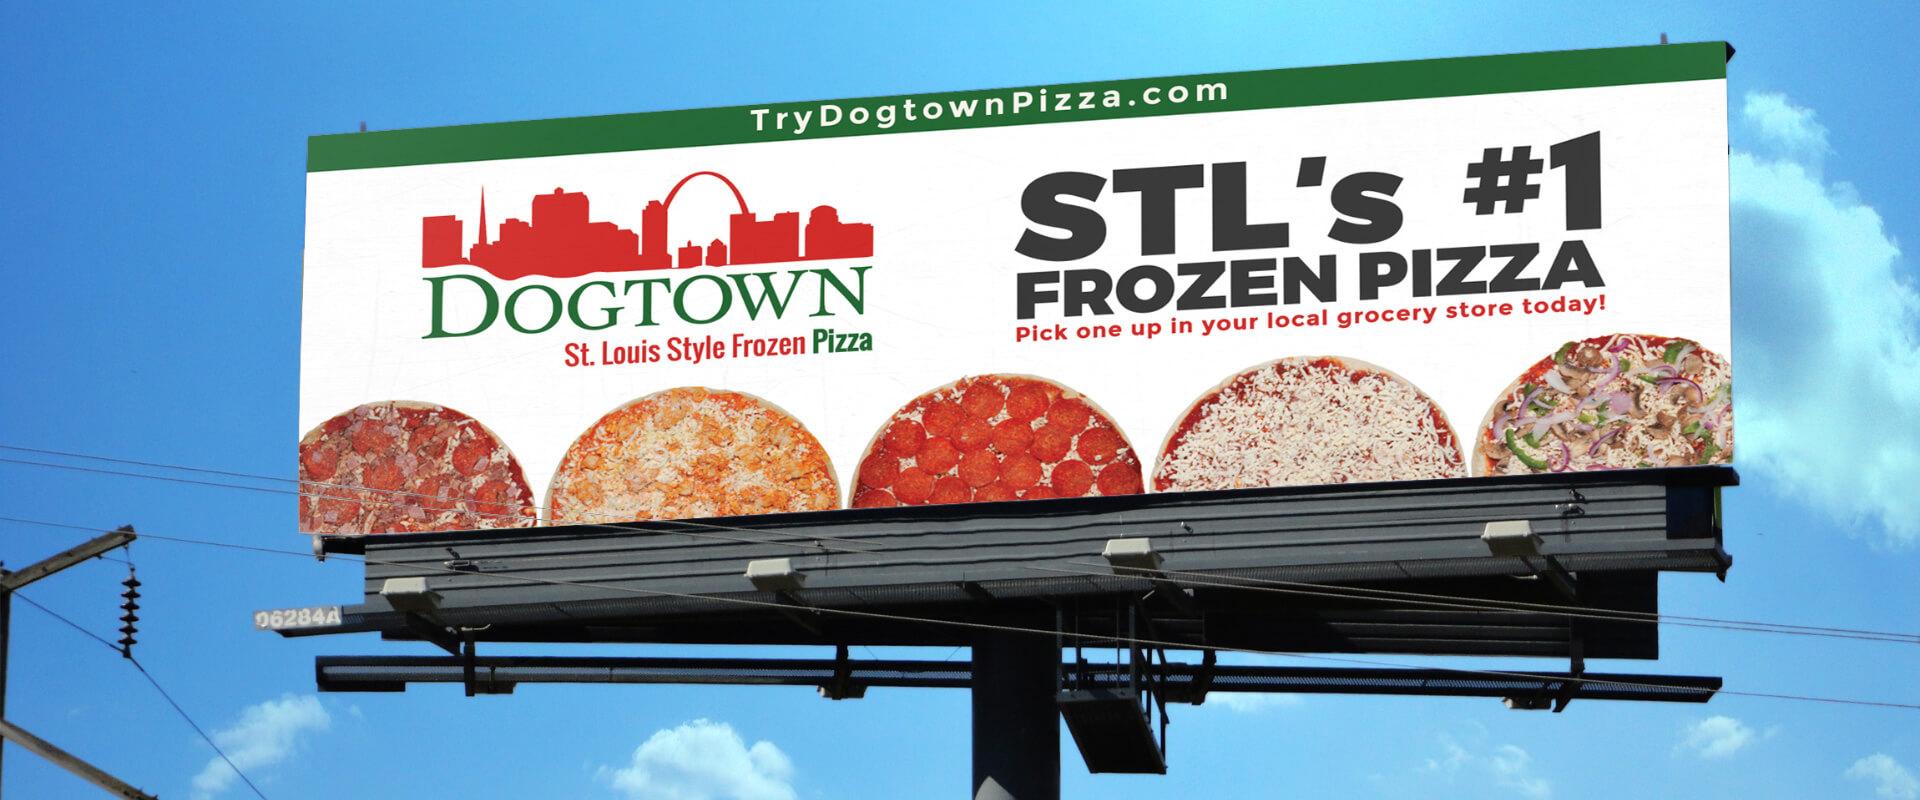 Dogtown Pizza billboard